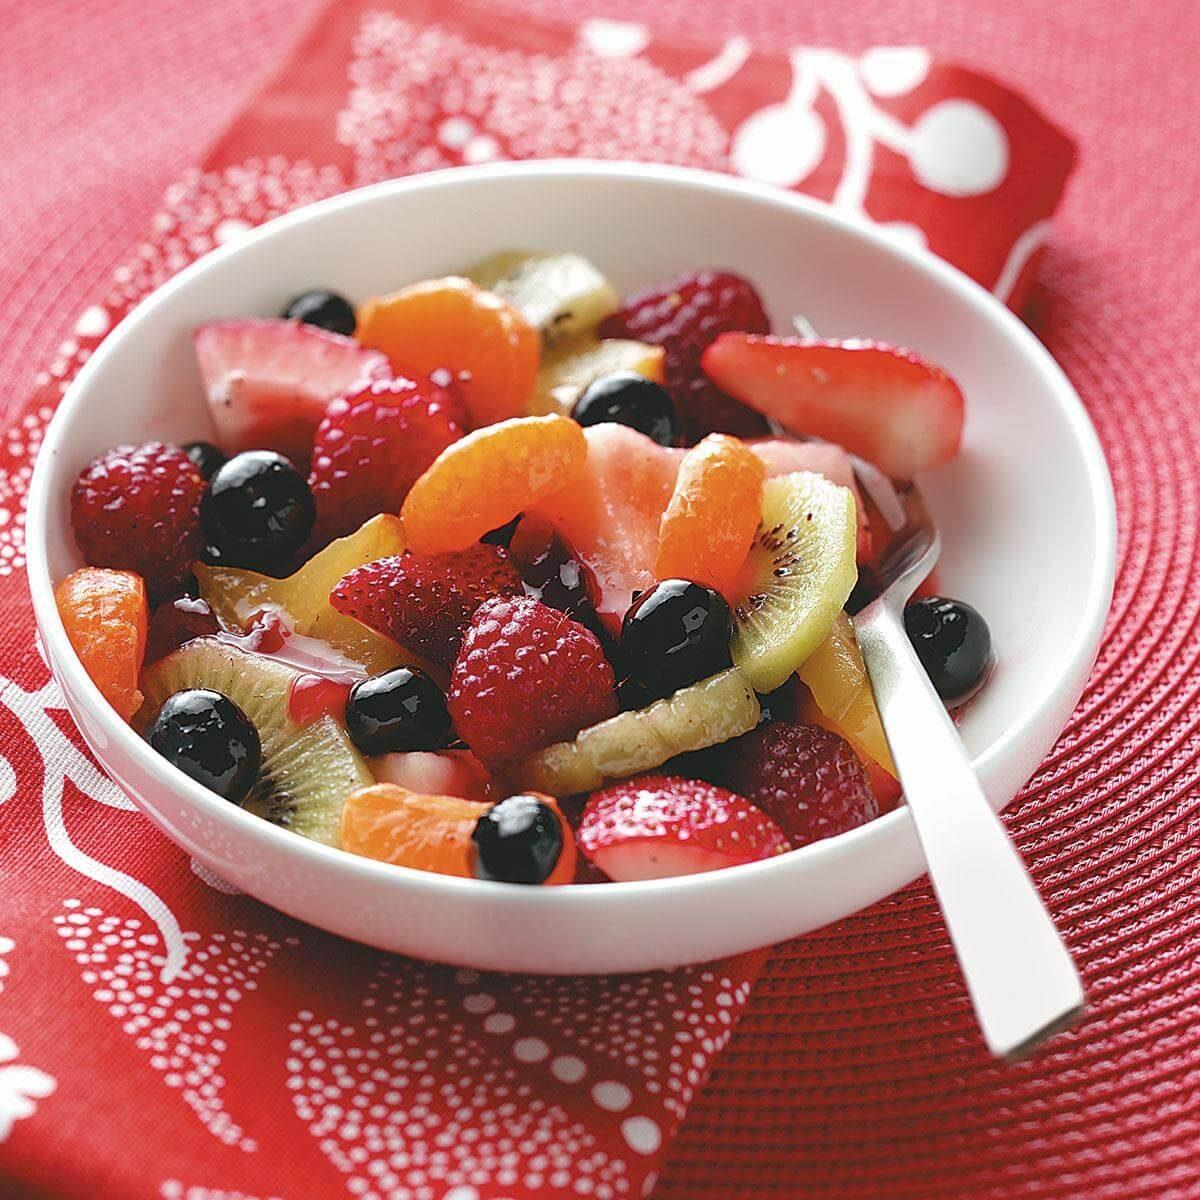 Fruit Salad with Raspberry Vinaigrette